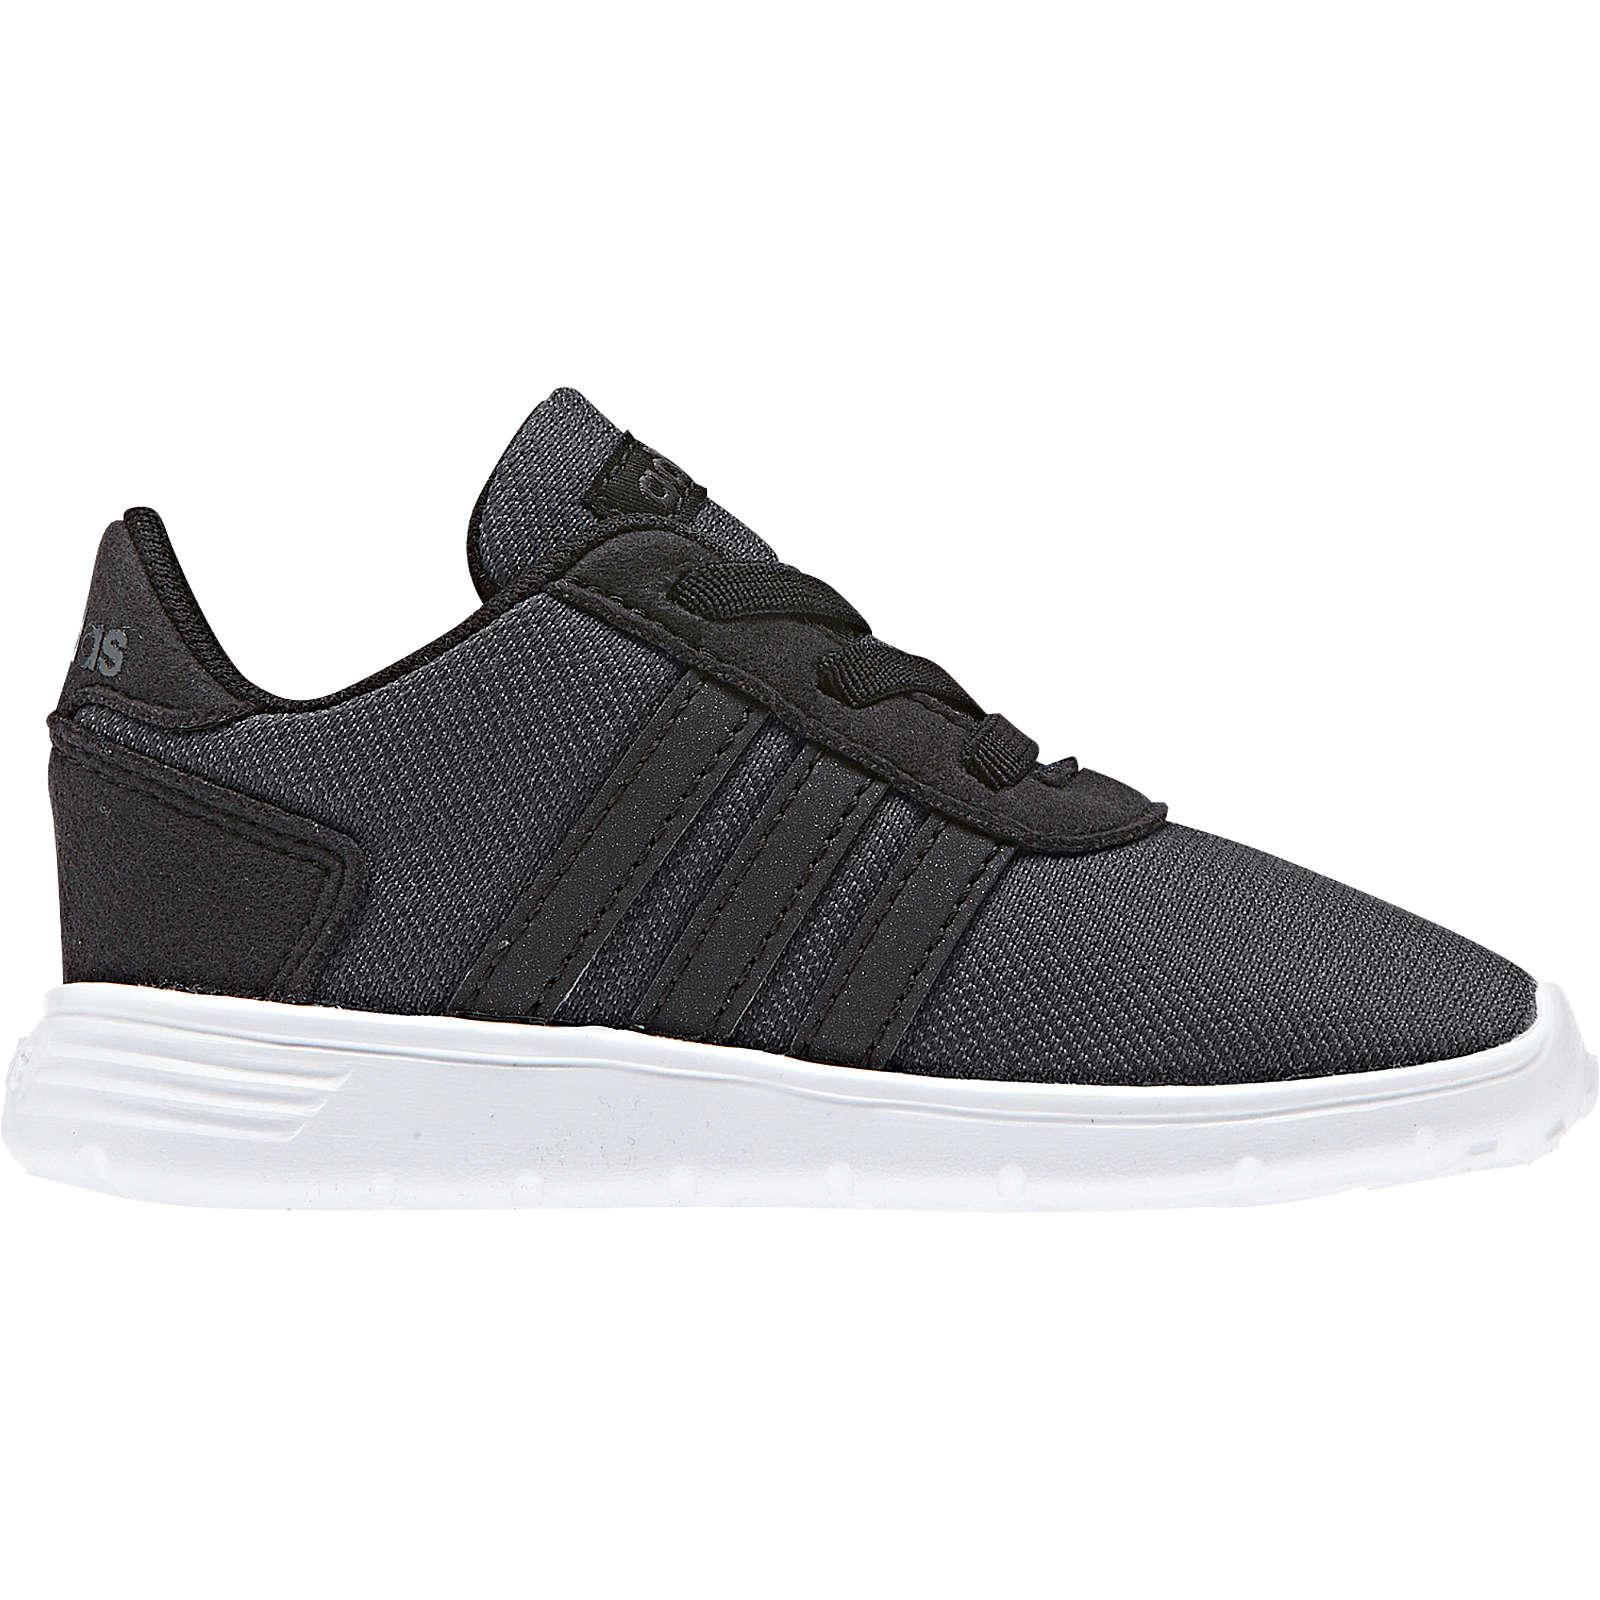 adidas Sport Inspired Baby Sneakers LITE RACER INF schwarz Gr. 19